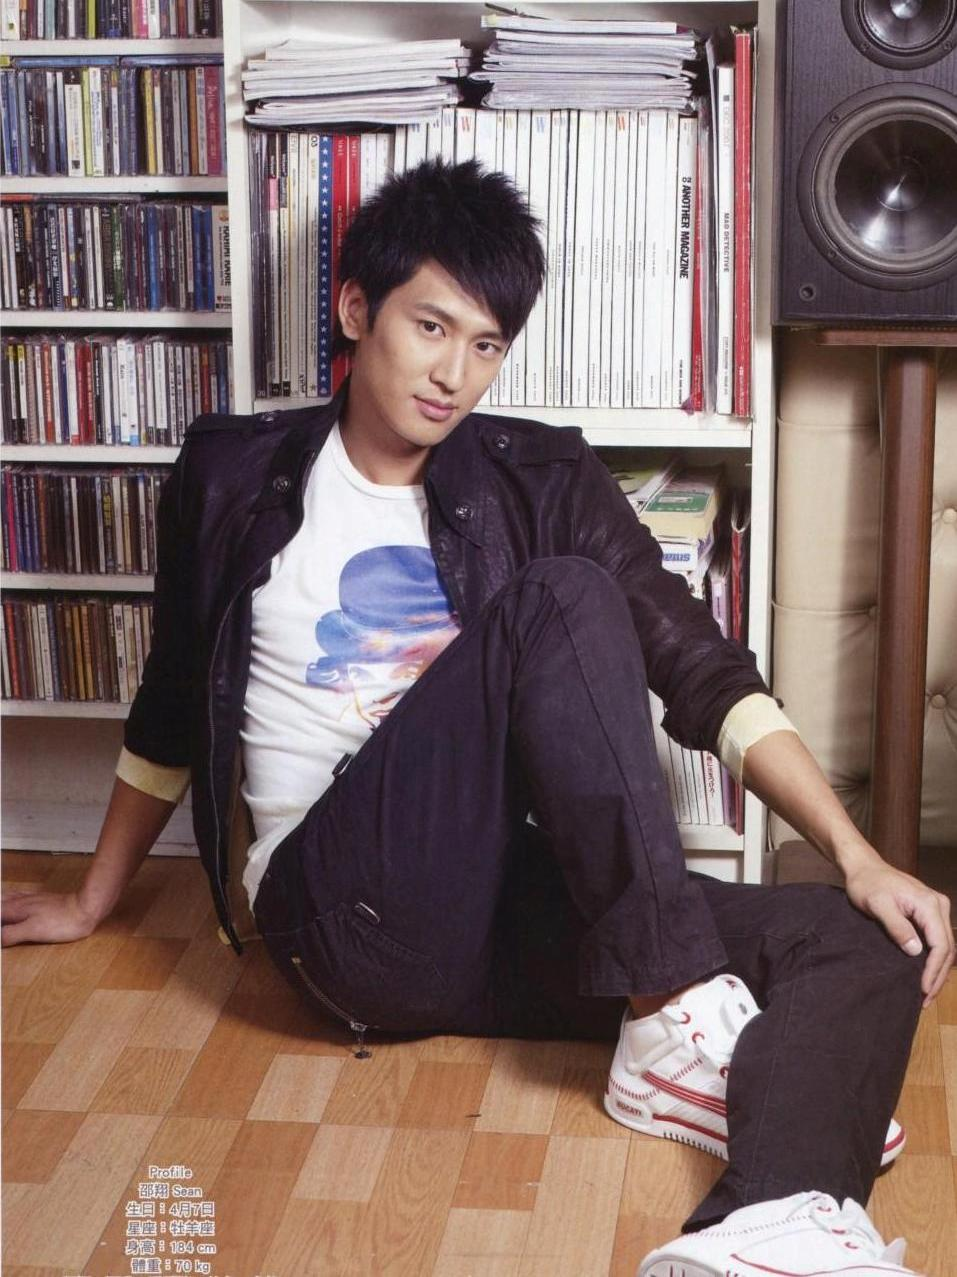 Lee Shiau Shiang